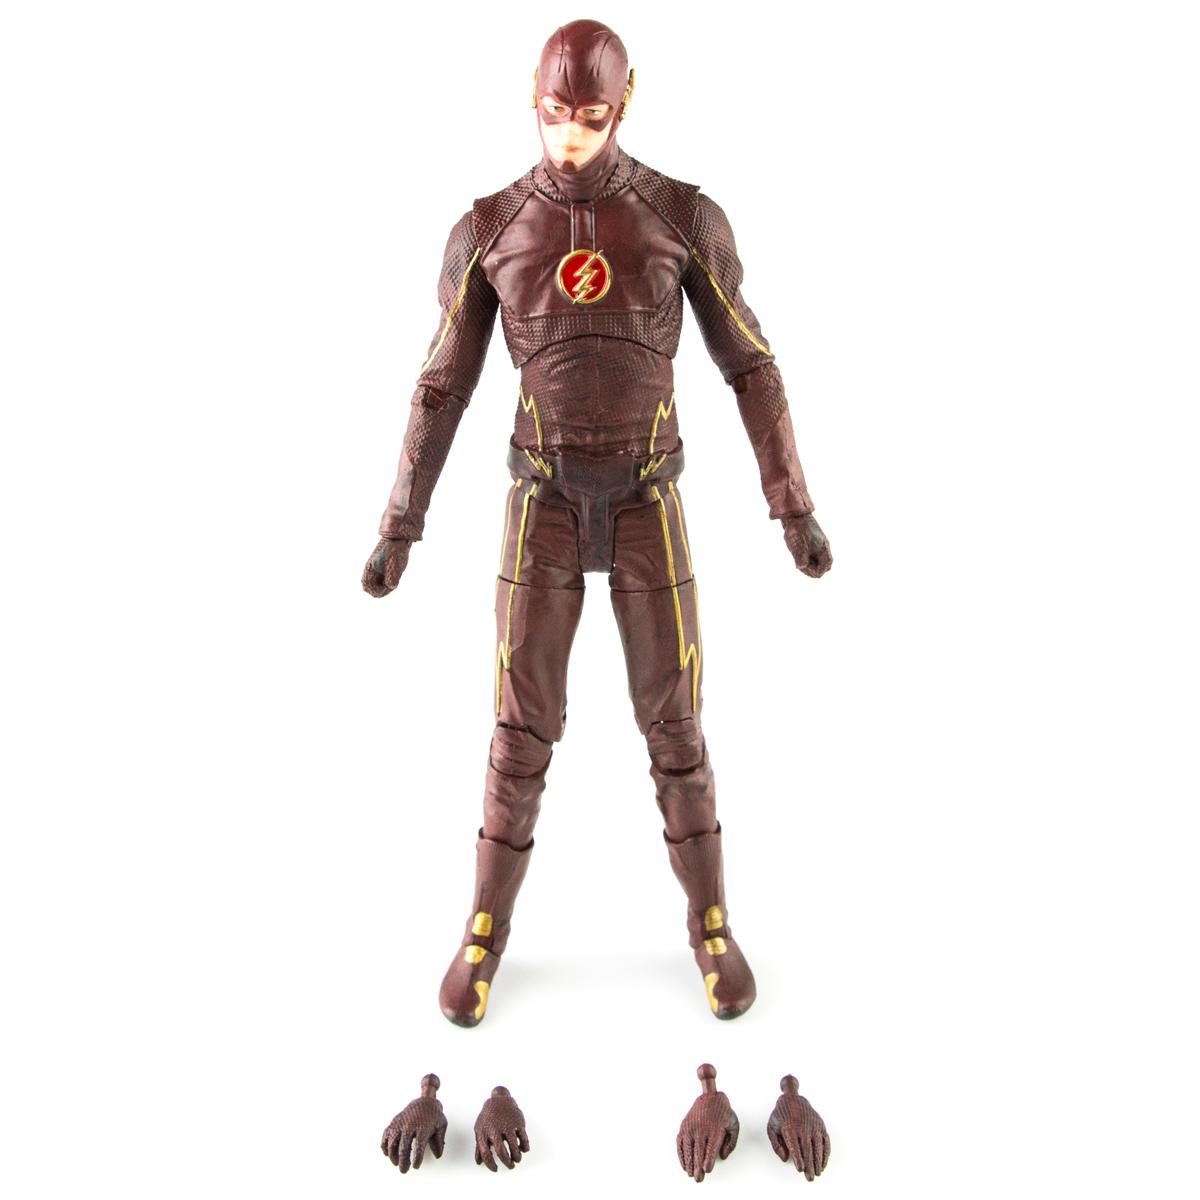 Boneco (Action Figure) The Flash TV Series - DC Collectibles